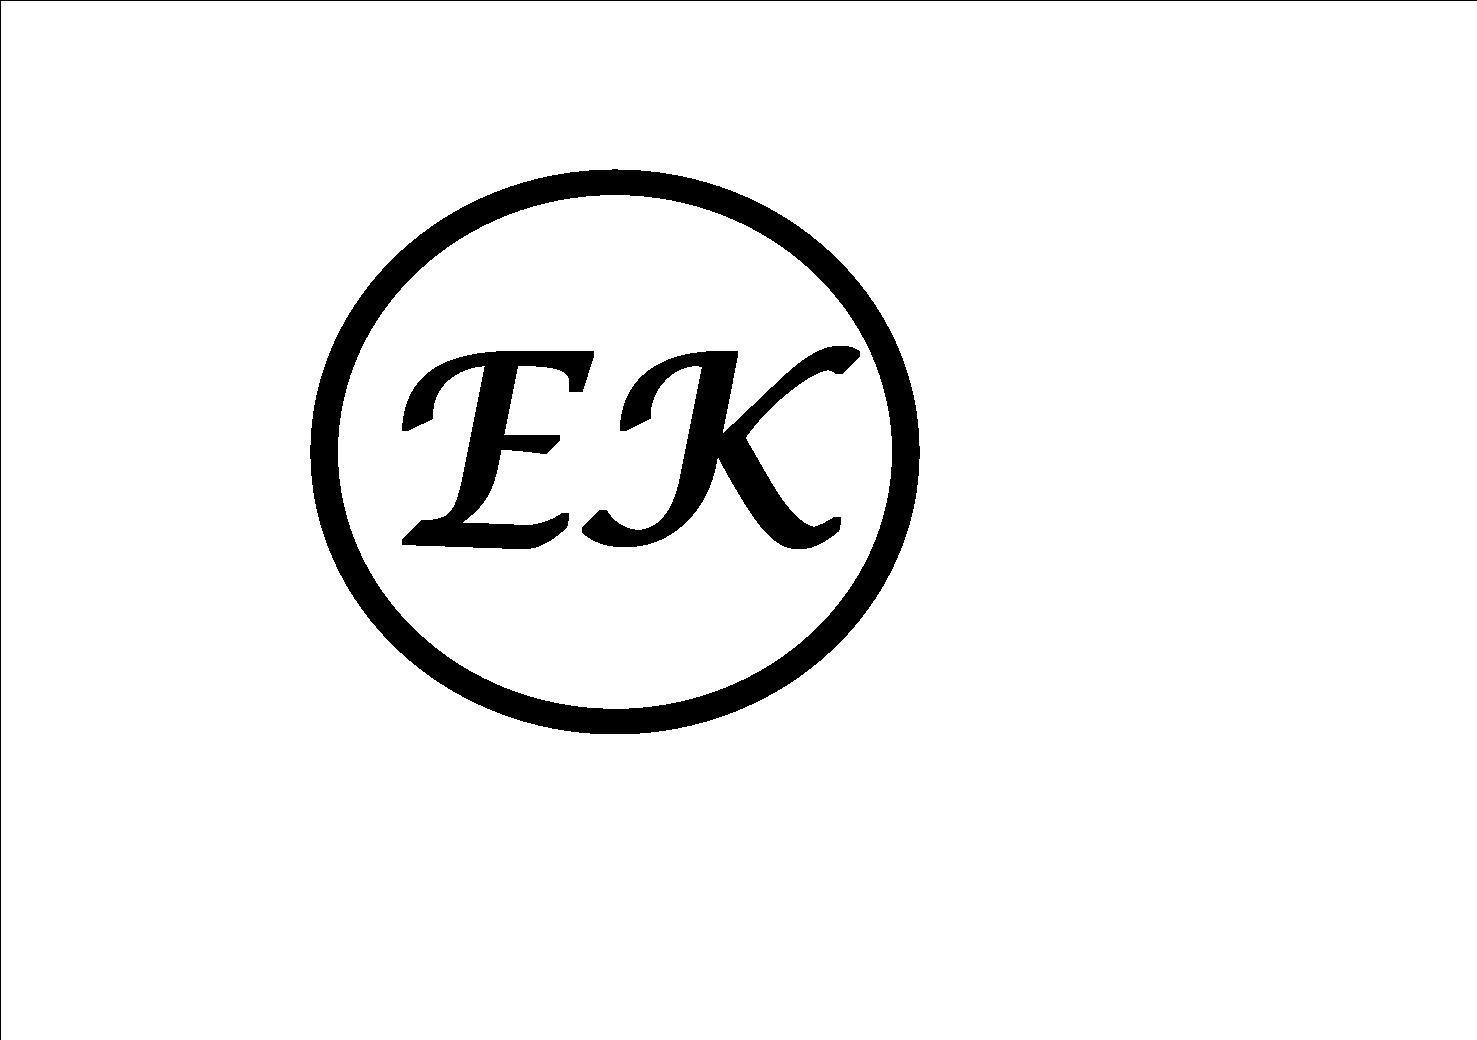 ek-logo-.kp133-sealt-maine-2016-page1-image1.jpg